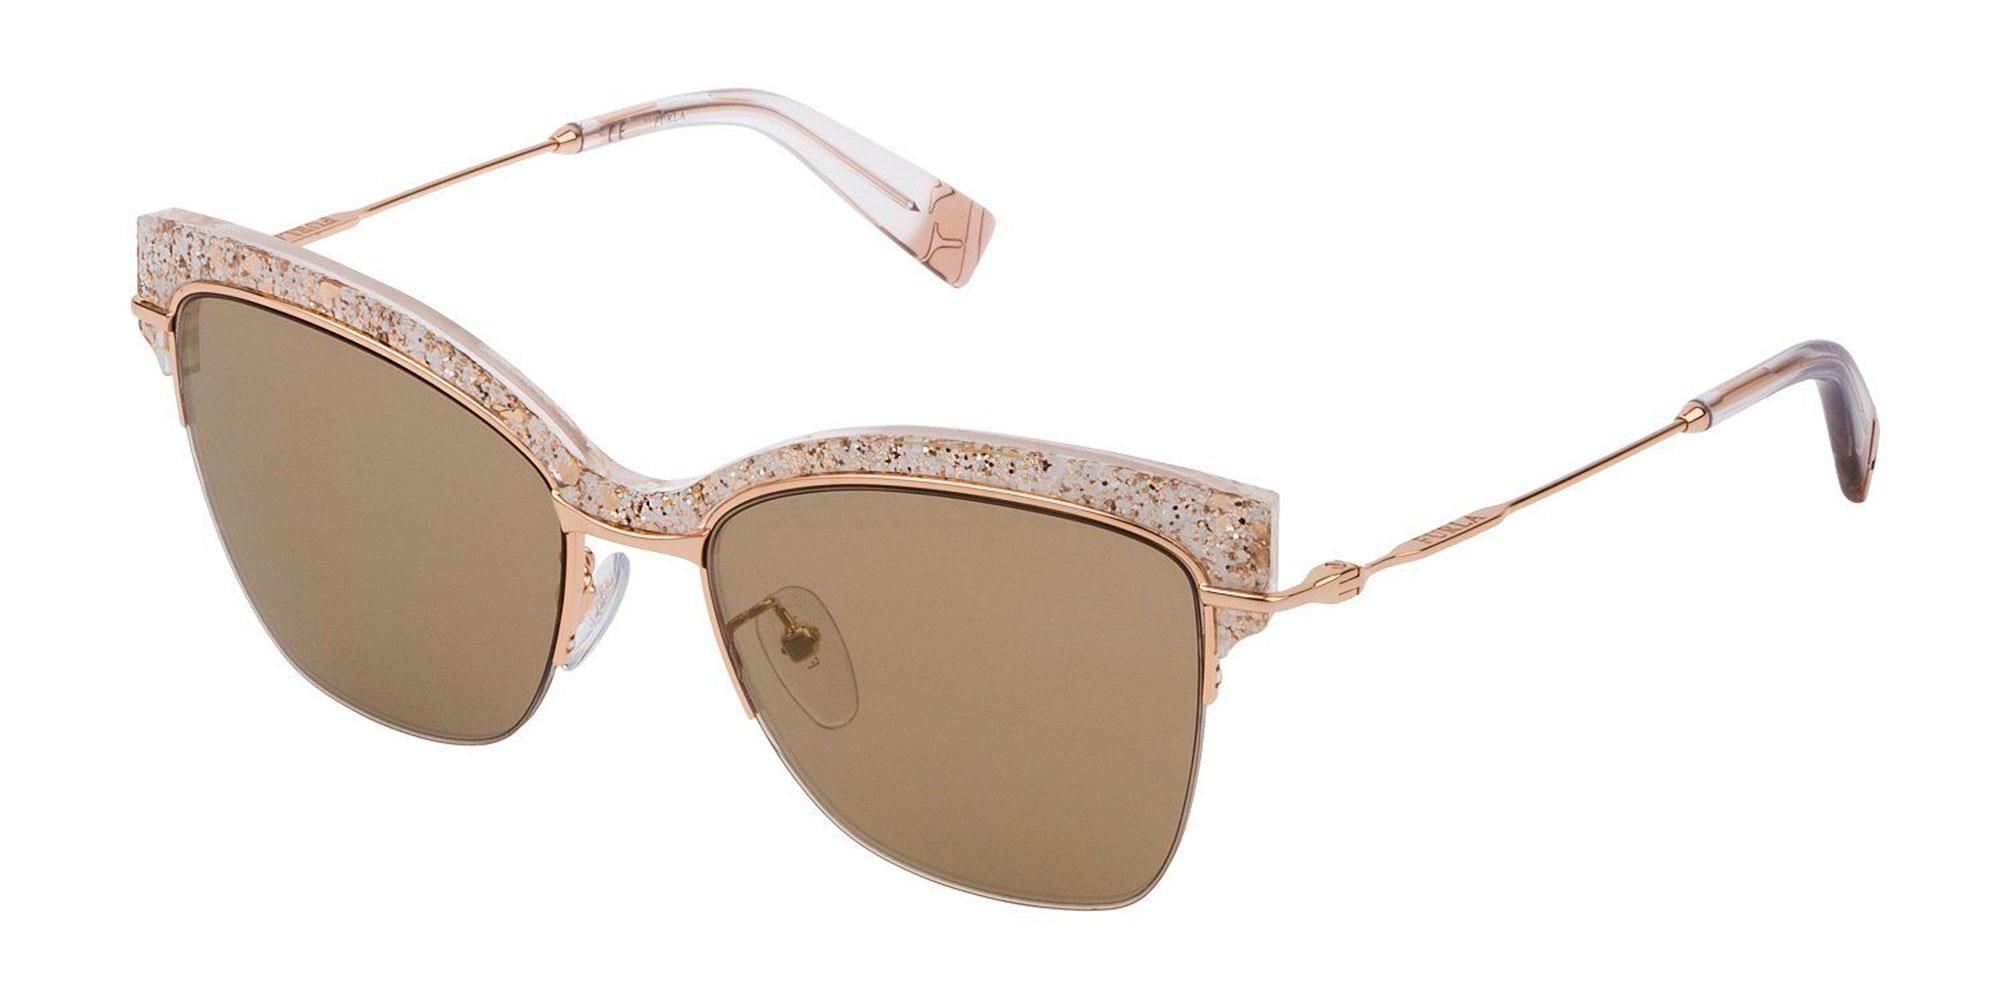 300G SFU312 Sunglasses, Furla